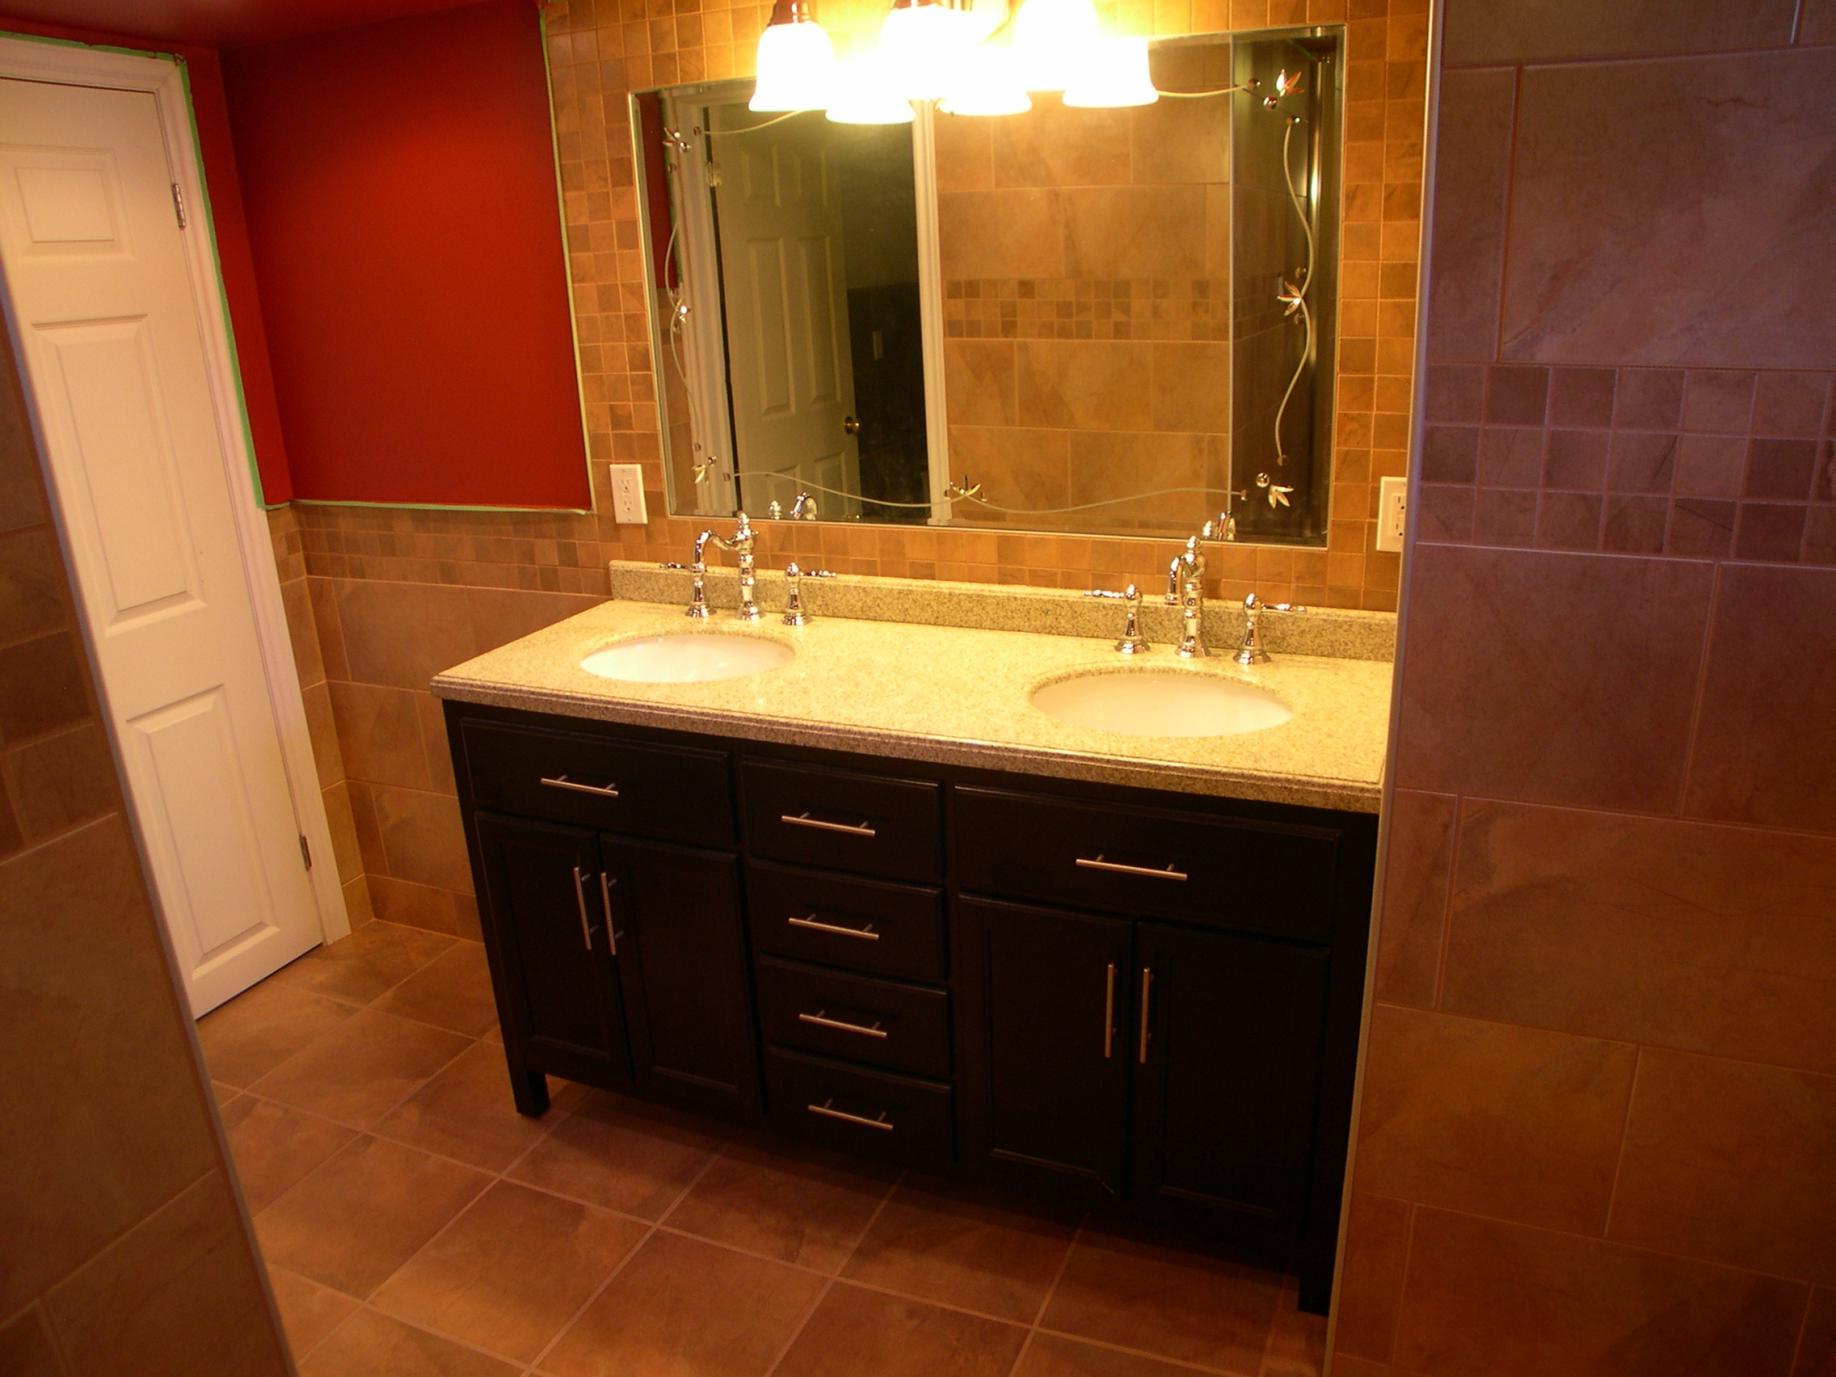 Basement Bathroom Remodeling Picture Post Contractor Talk